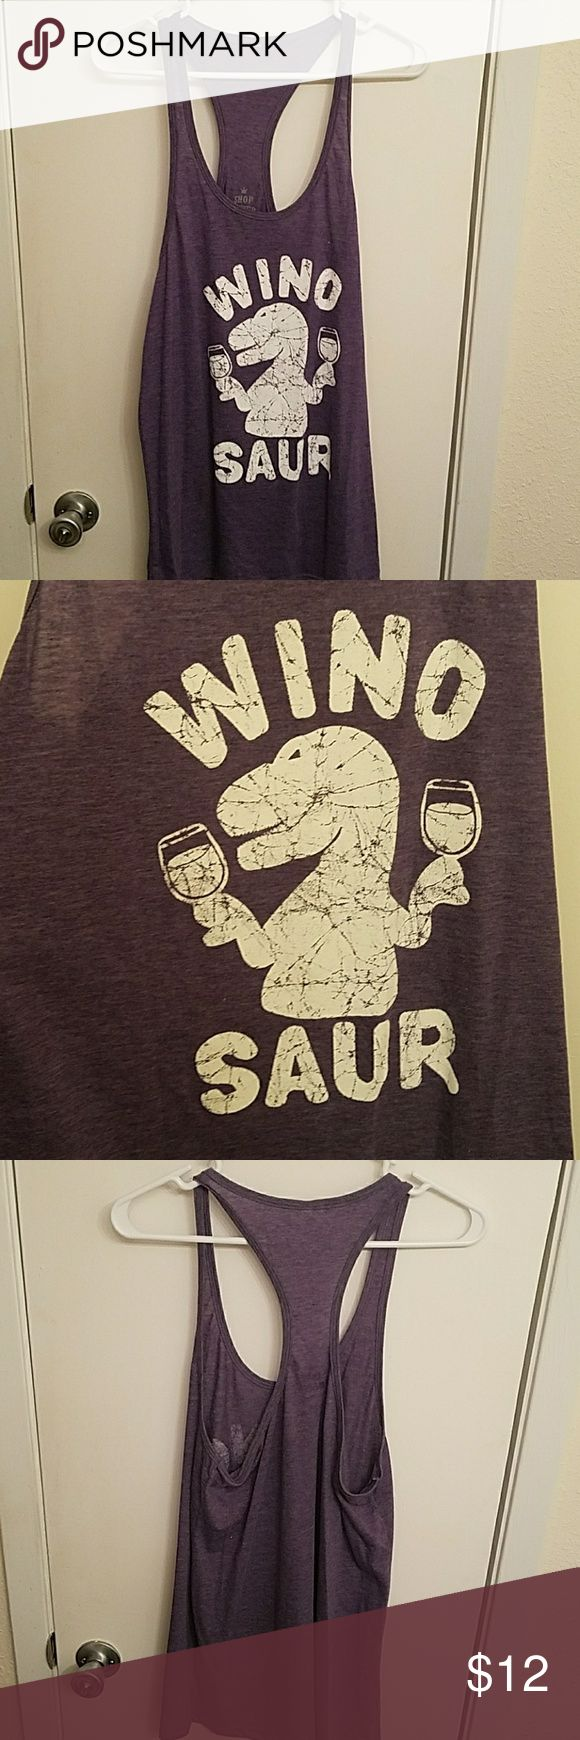 Wino saur razor back tank Super fun and comfy. Never worn.  Fits like an XL not XXL shop 4 ever Tops Tank Tops